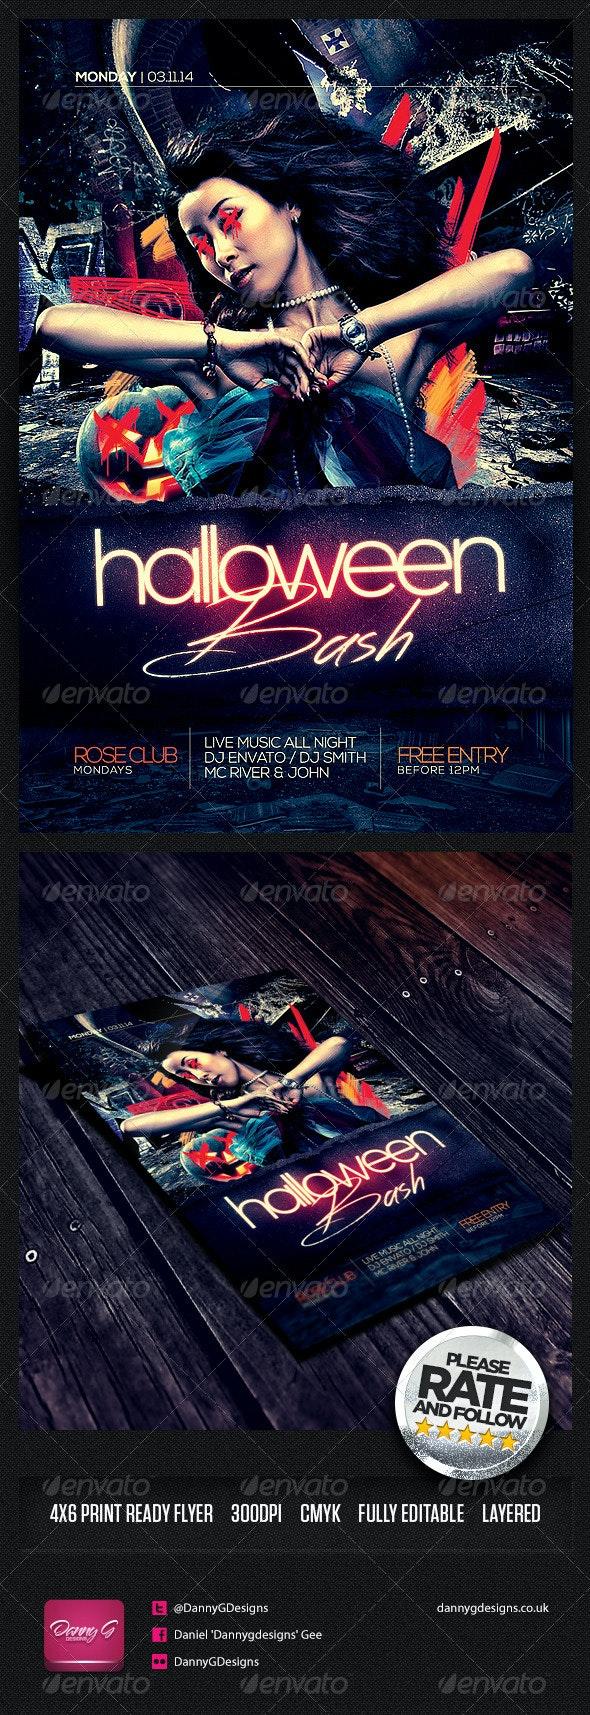 Halloween Bash Flyer Template PSD - Holidays Events